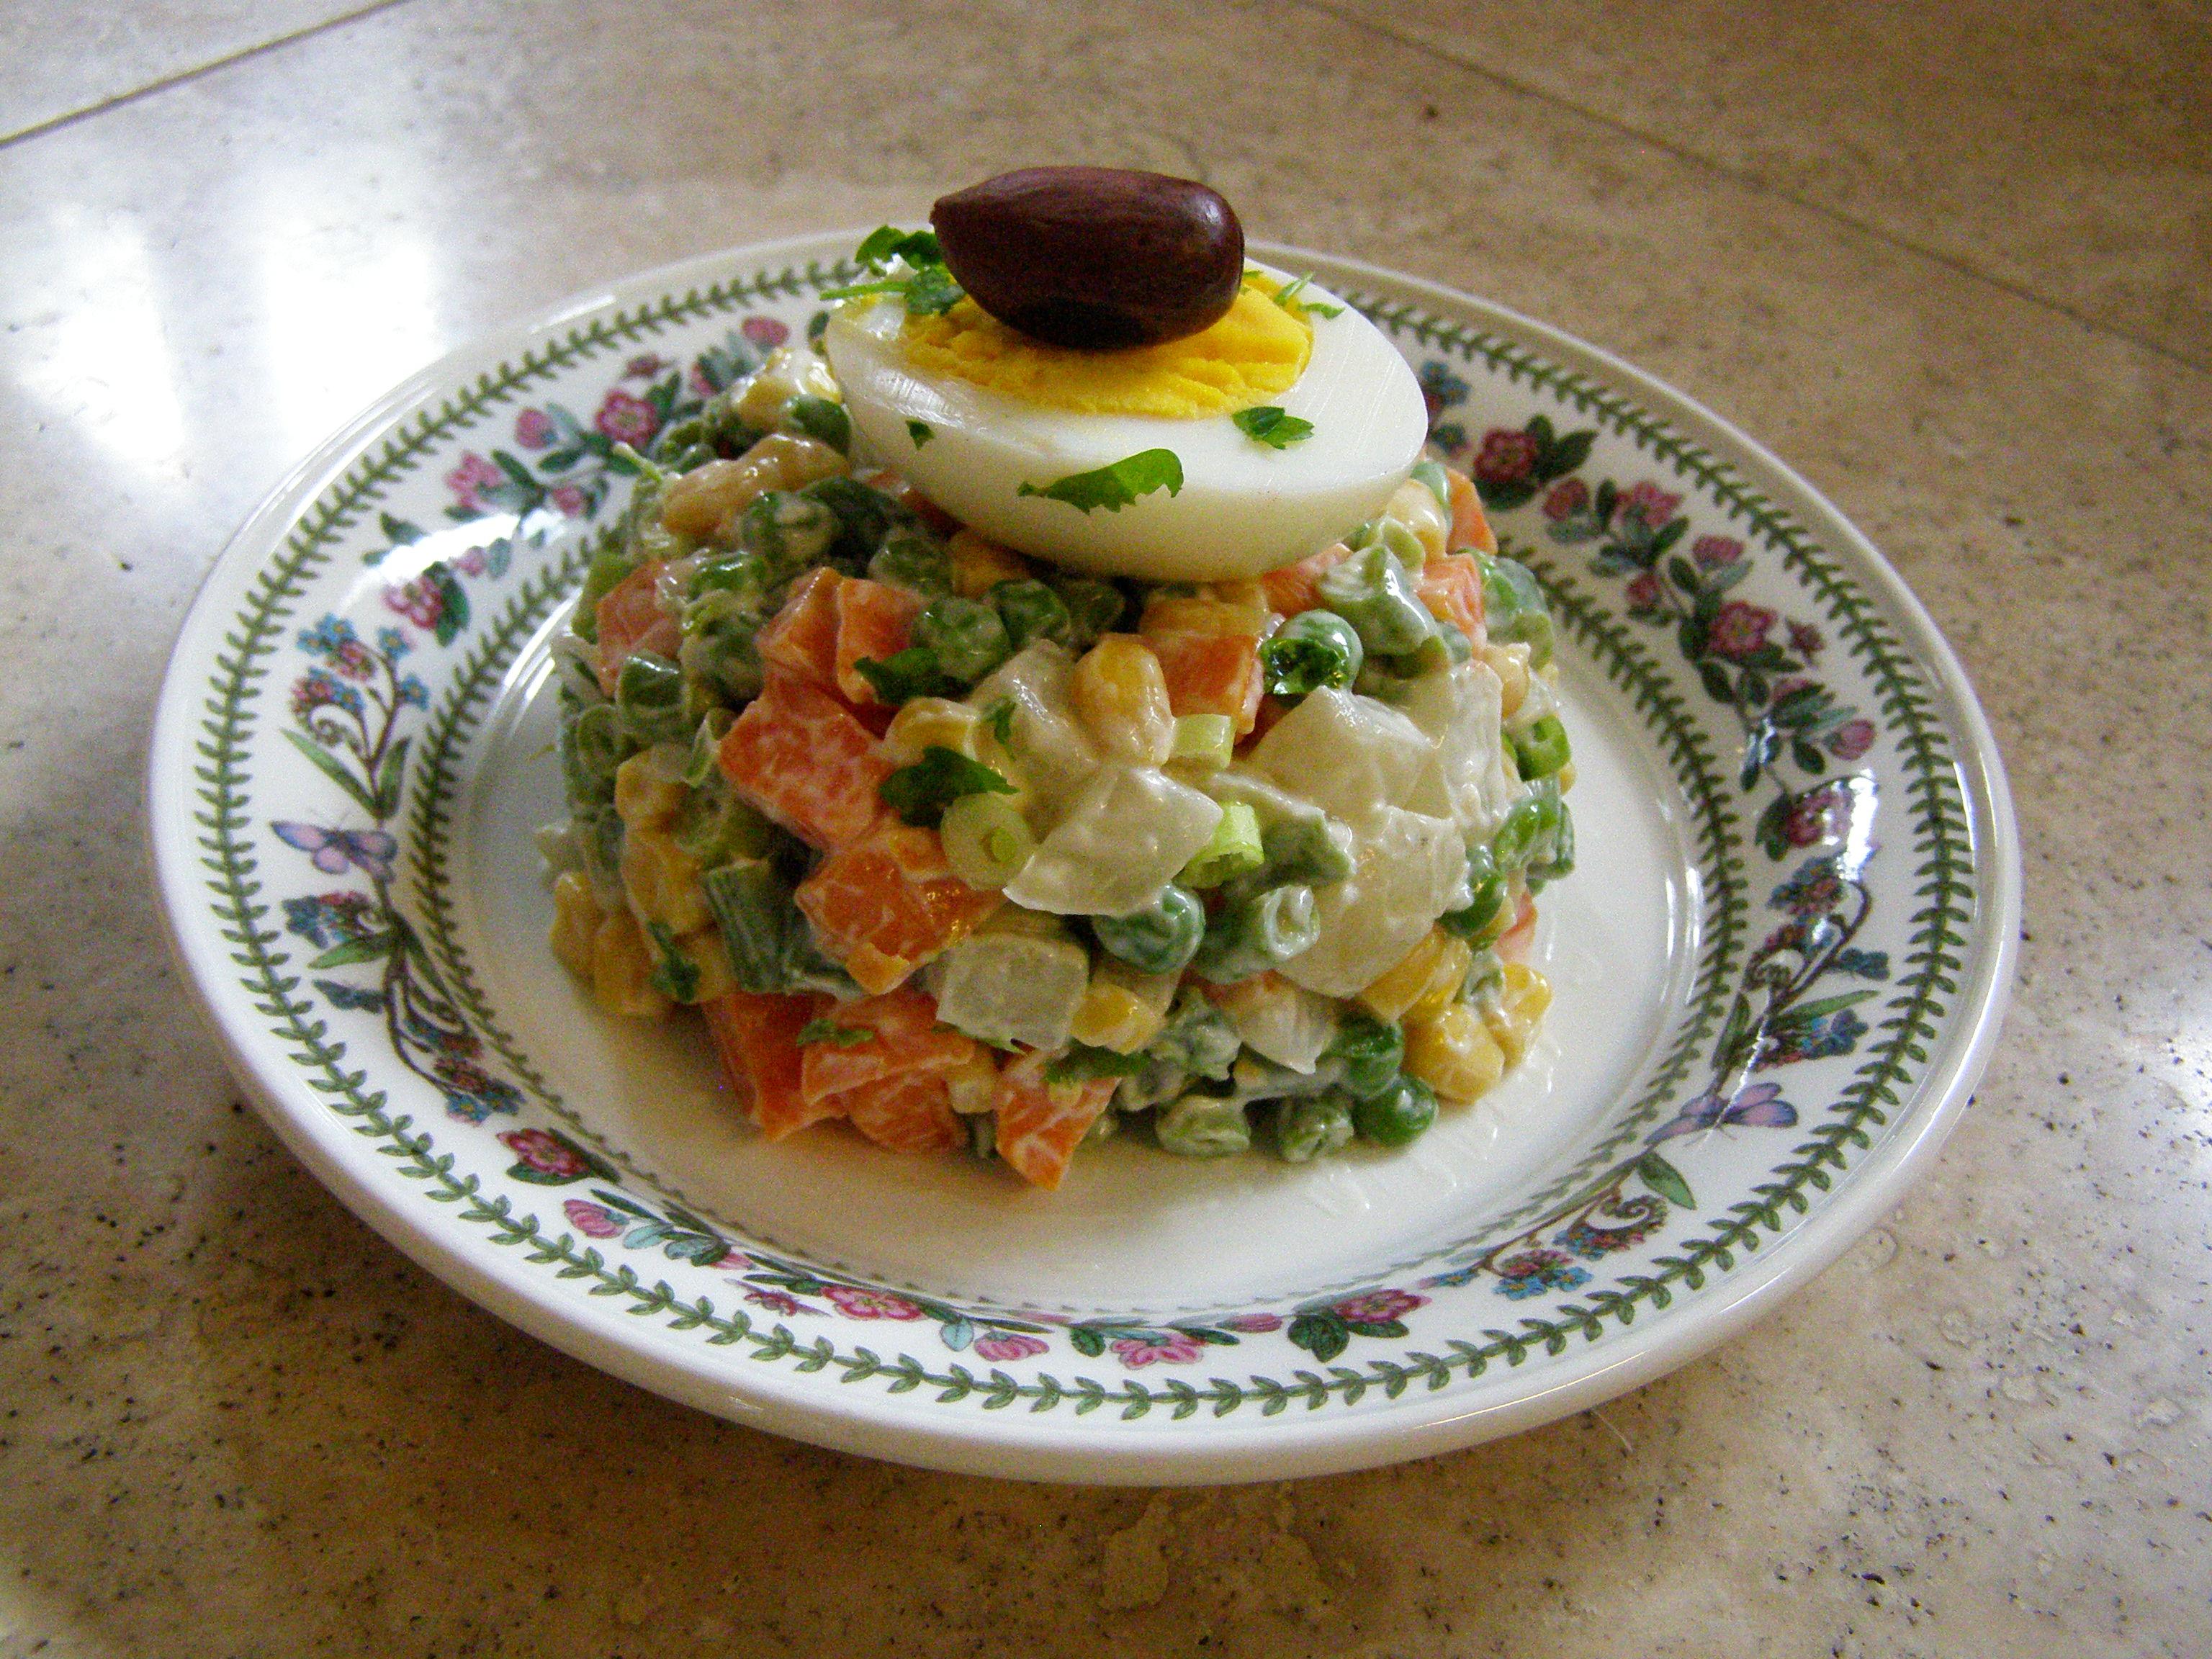 mac doine de l gumes or russian salad the cooking frog 39 s blog. Black Bedroom Furniture Sets. Home Design Ideas